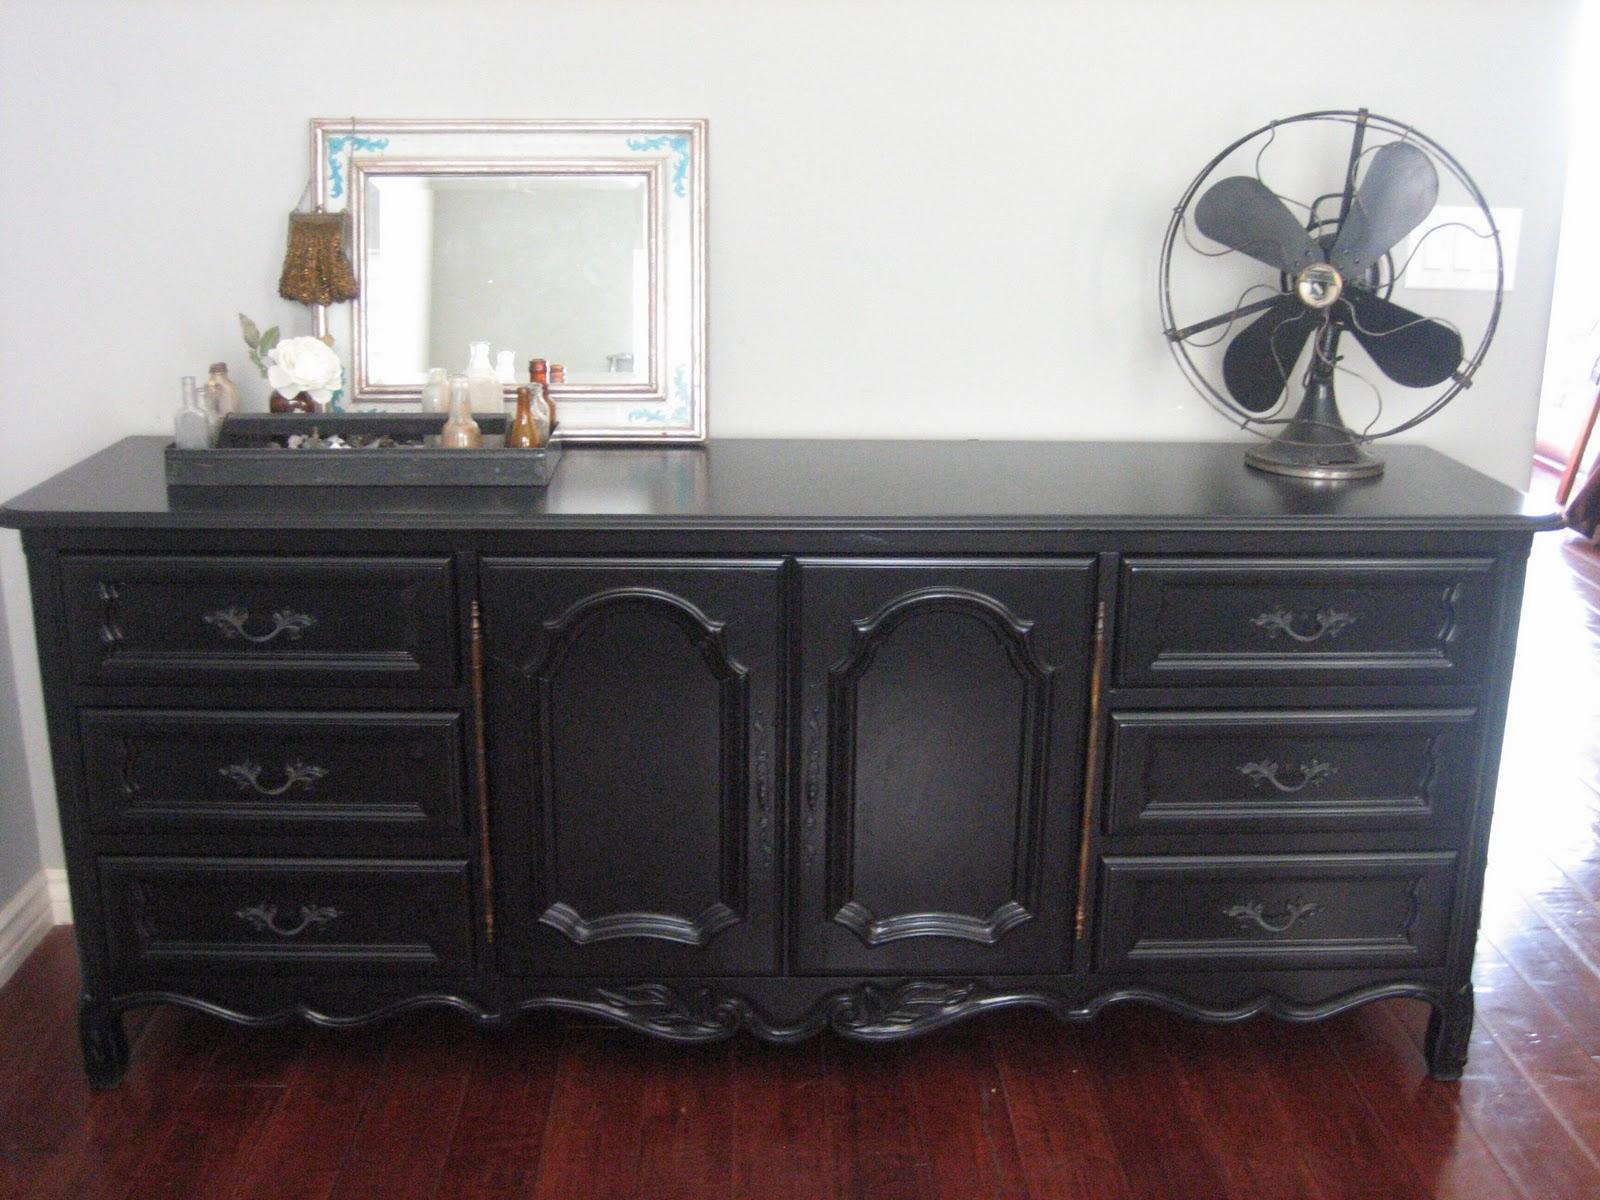 Black shabby chic furniture - Black Dresser A Bed